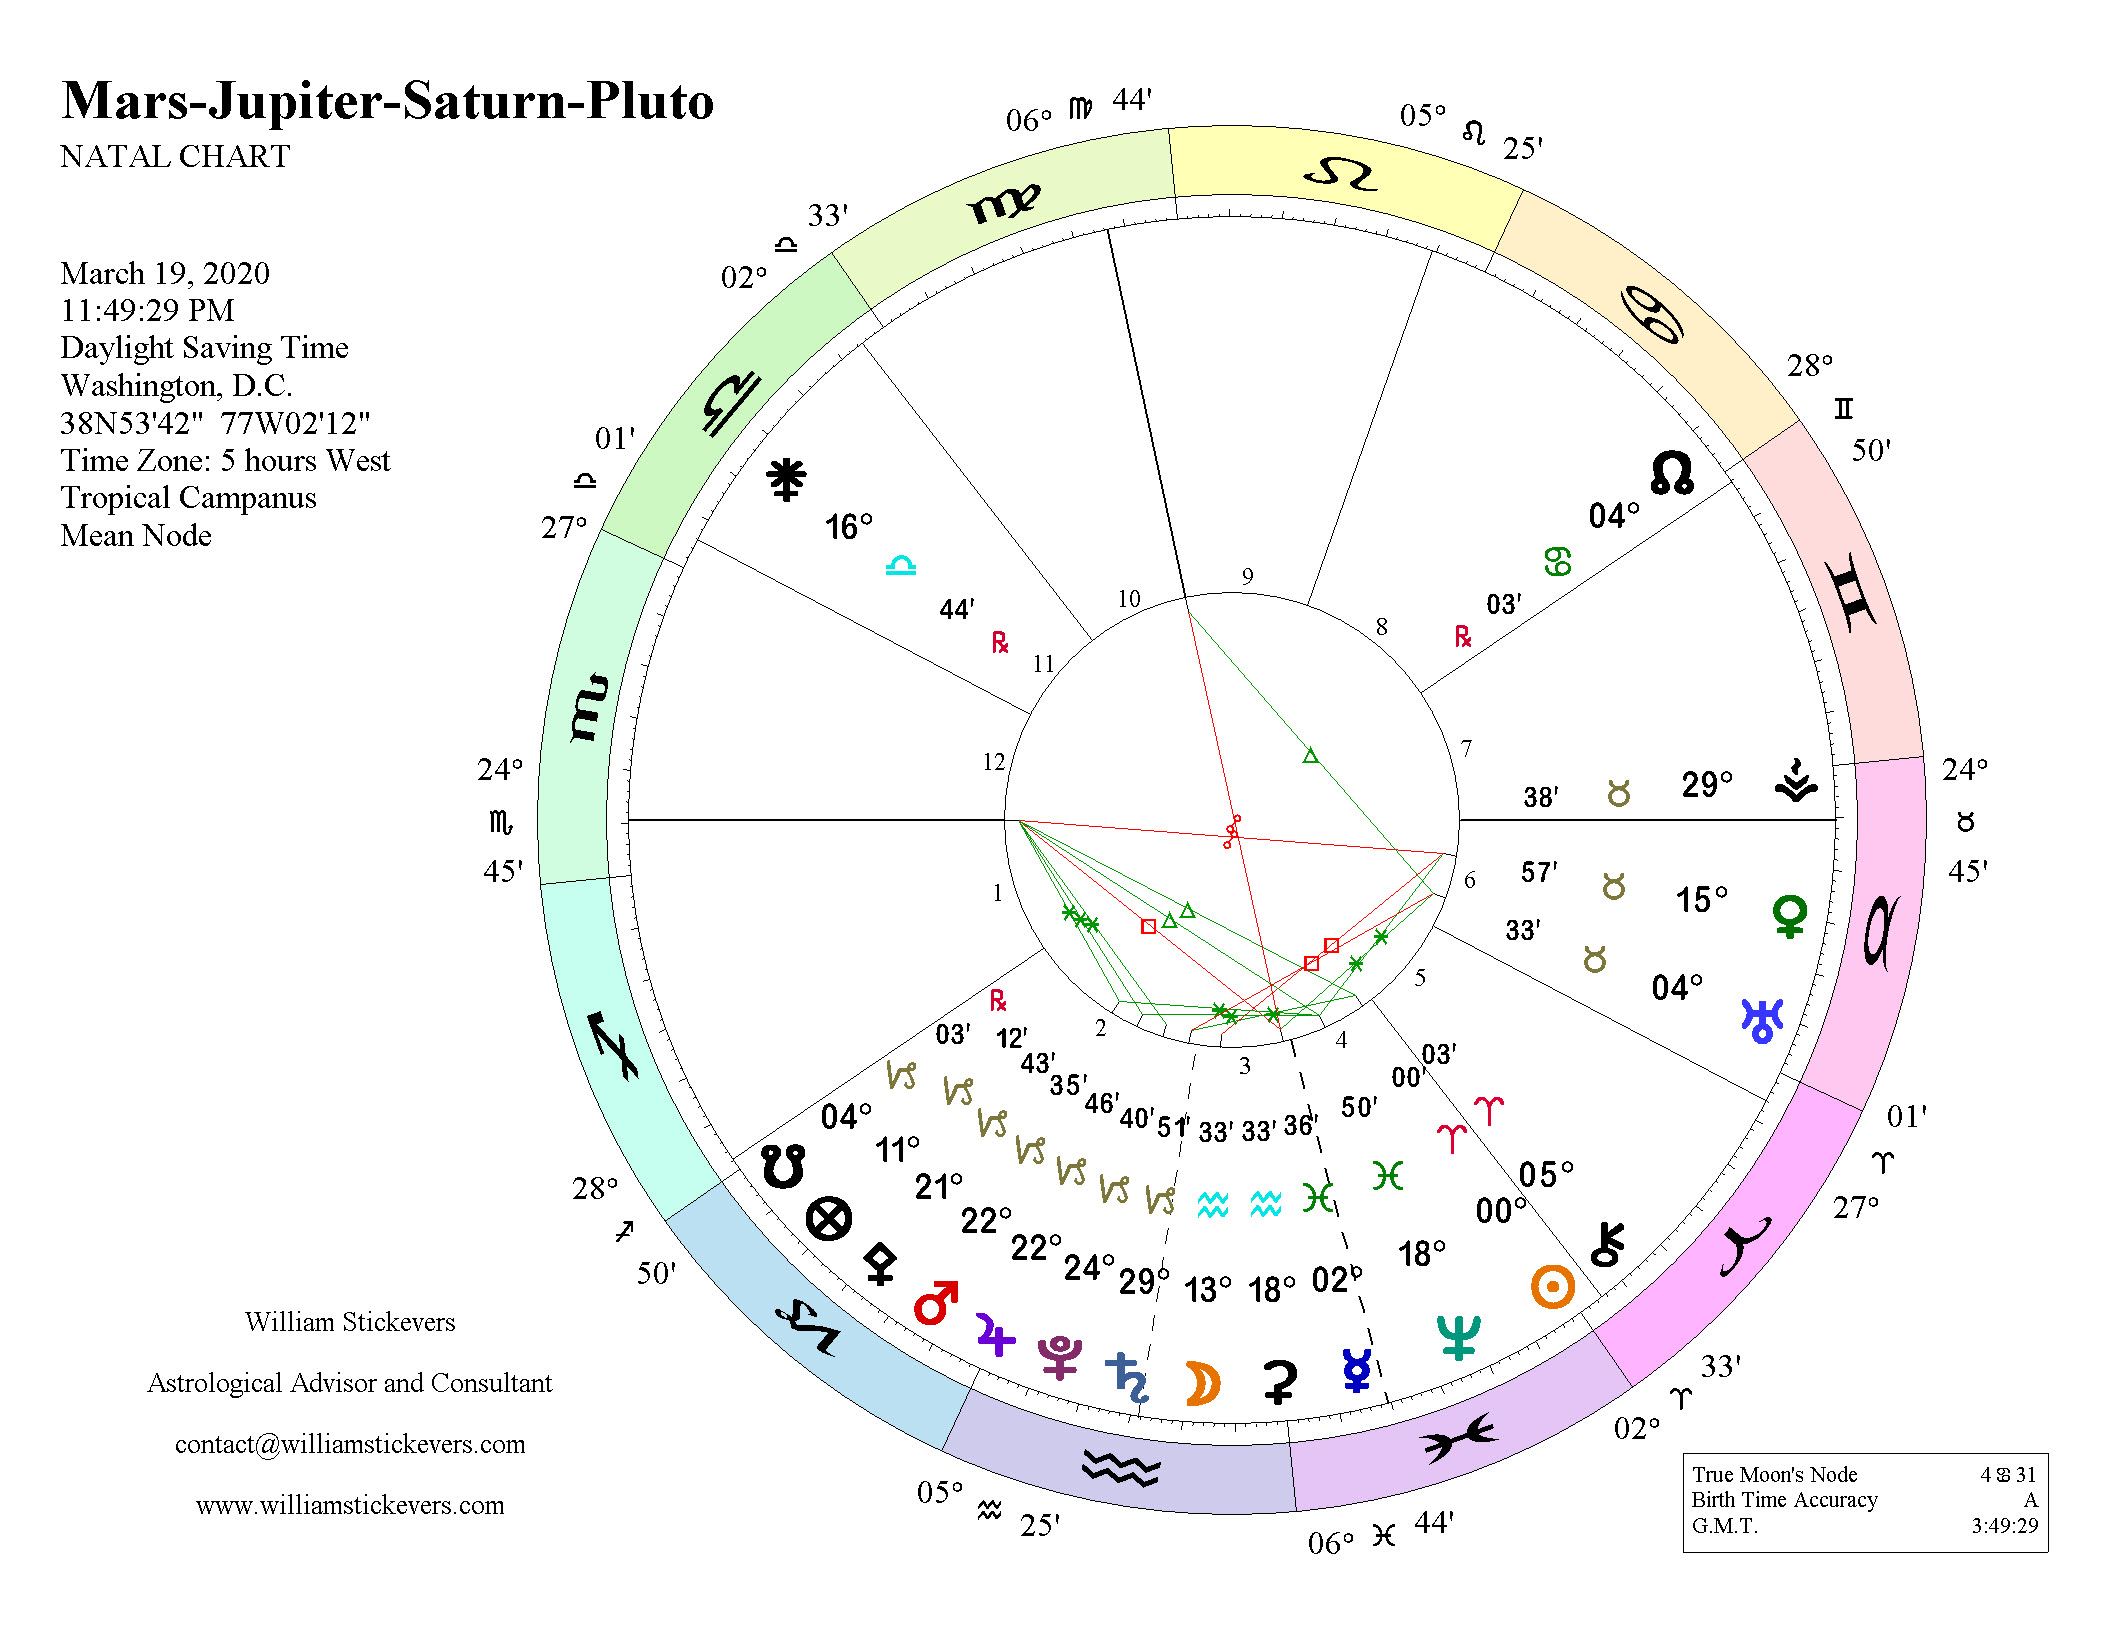 Mars-Jupiter-Saturn-Pluto Conjunction   WILLIAM STICKEVERS